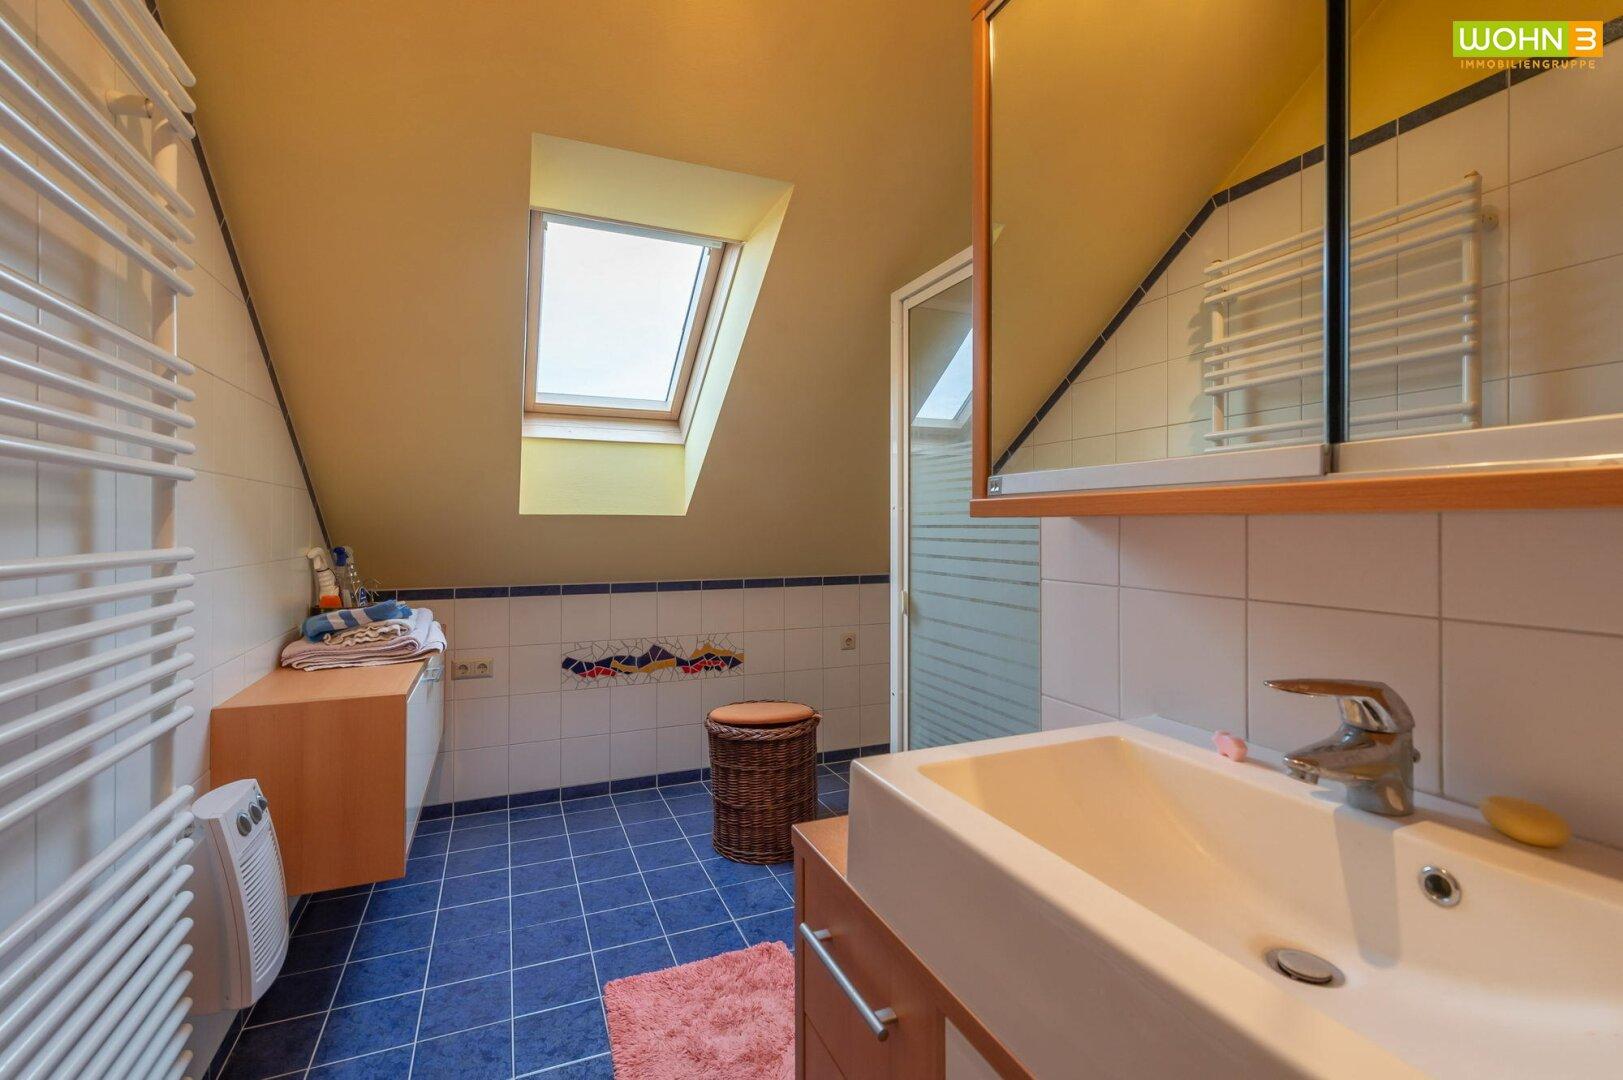 Badezimmer mit Dusche im Dachgeschoß